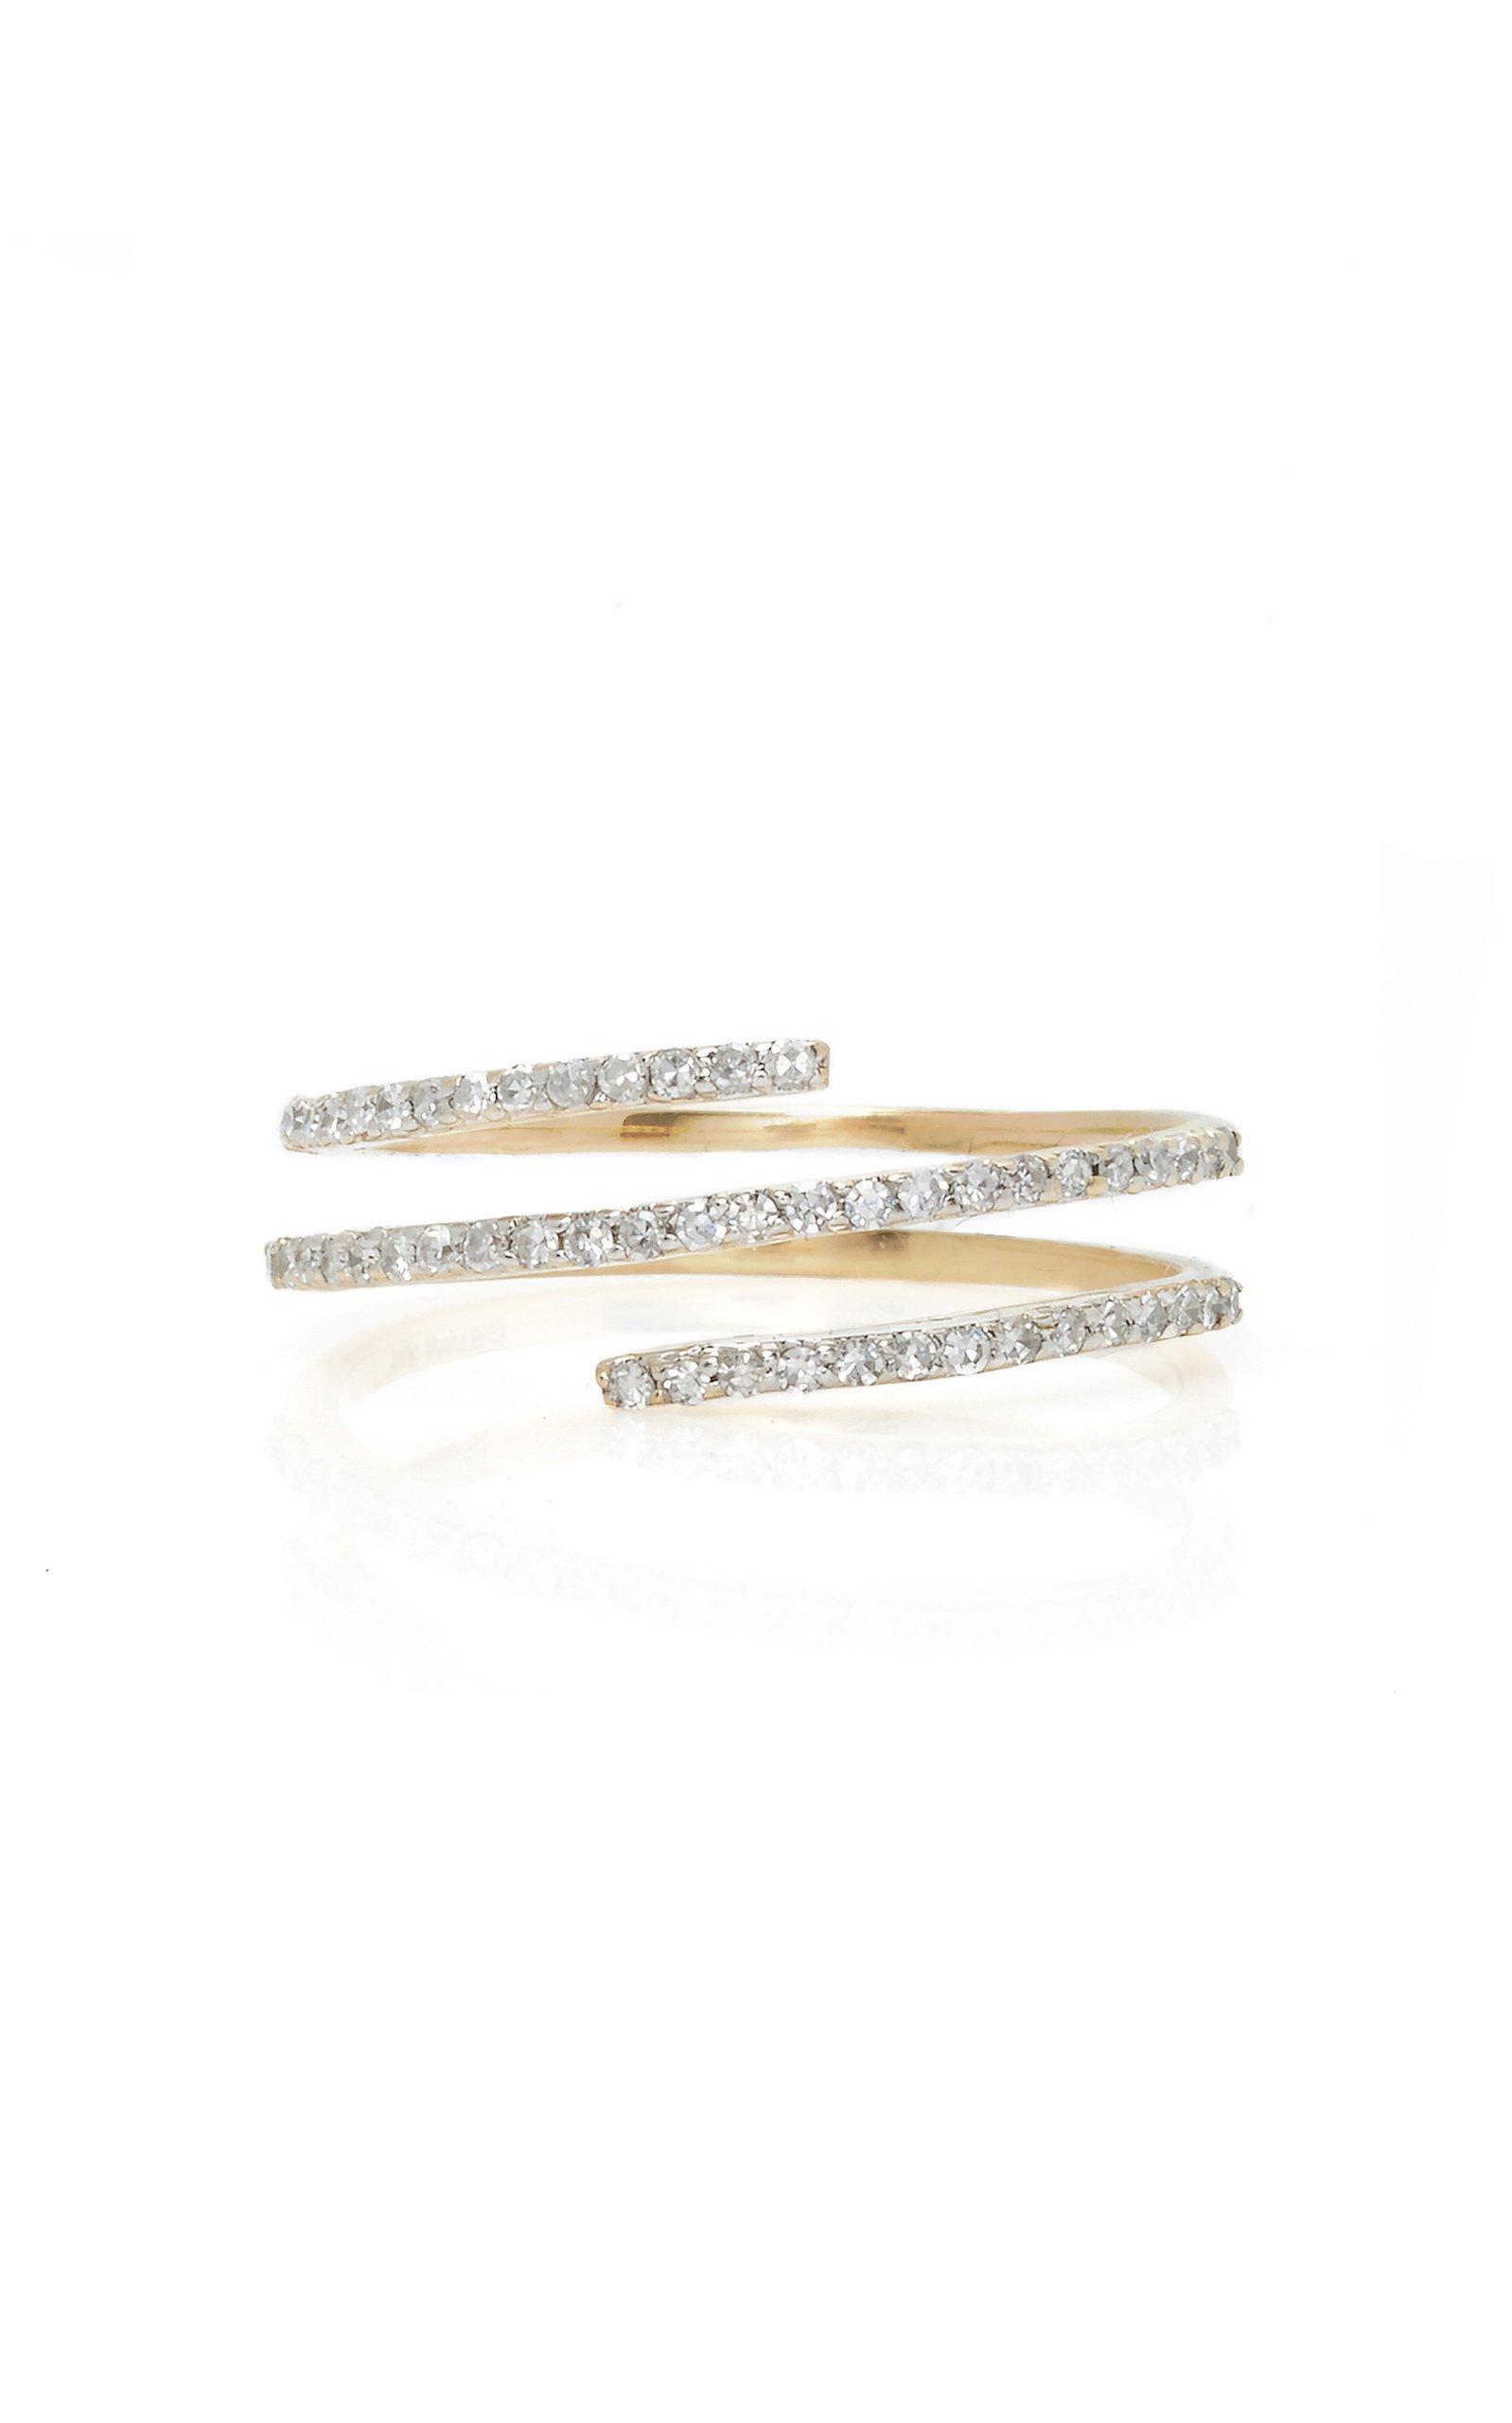 Mateo 14K Gold Diamond Ring